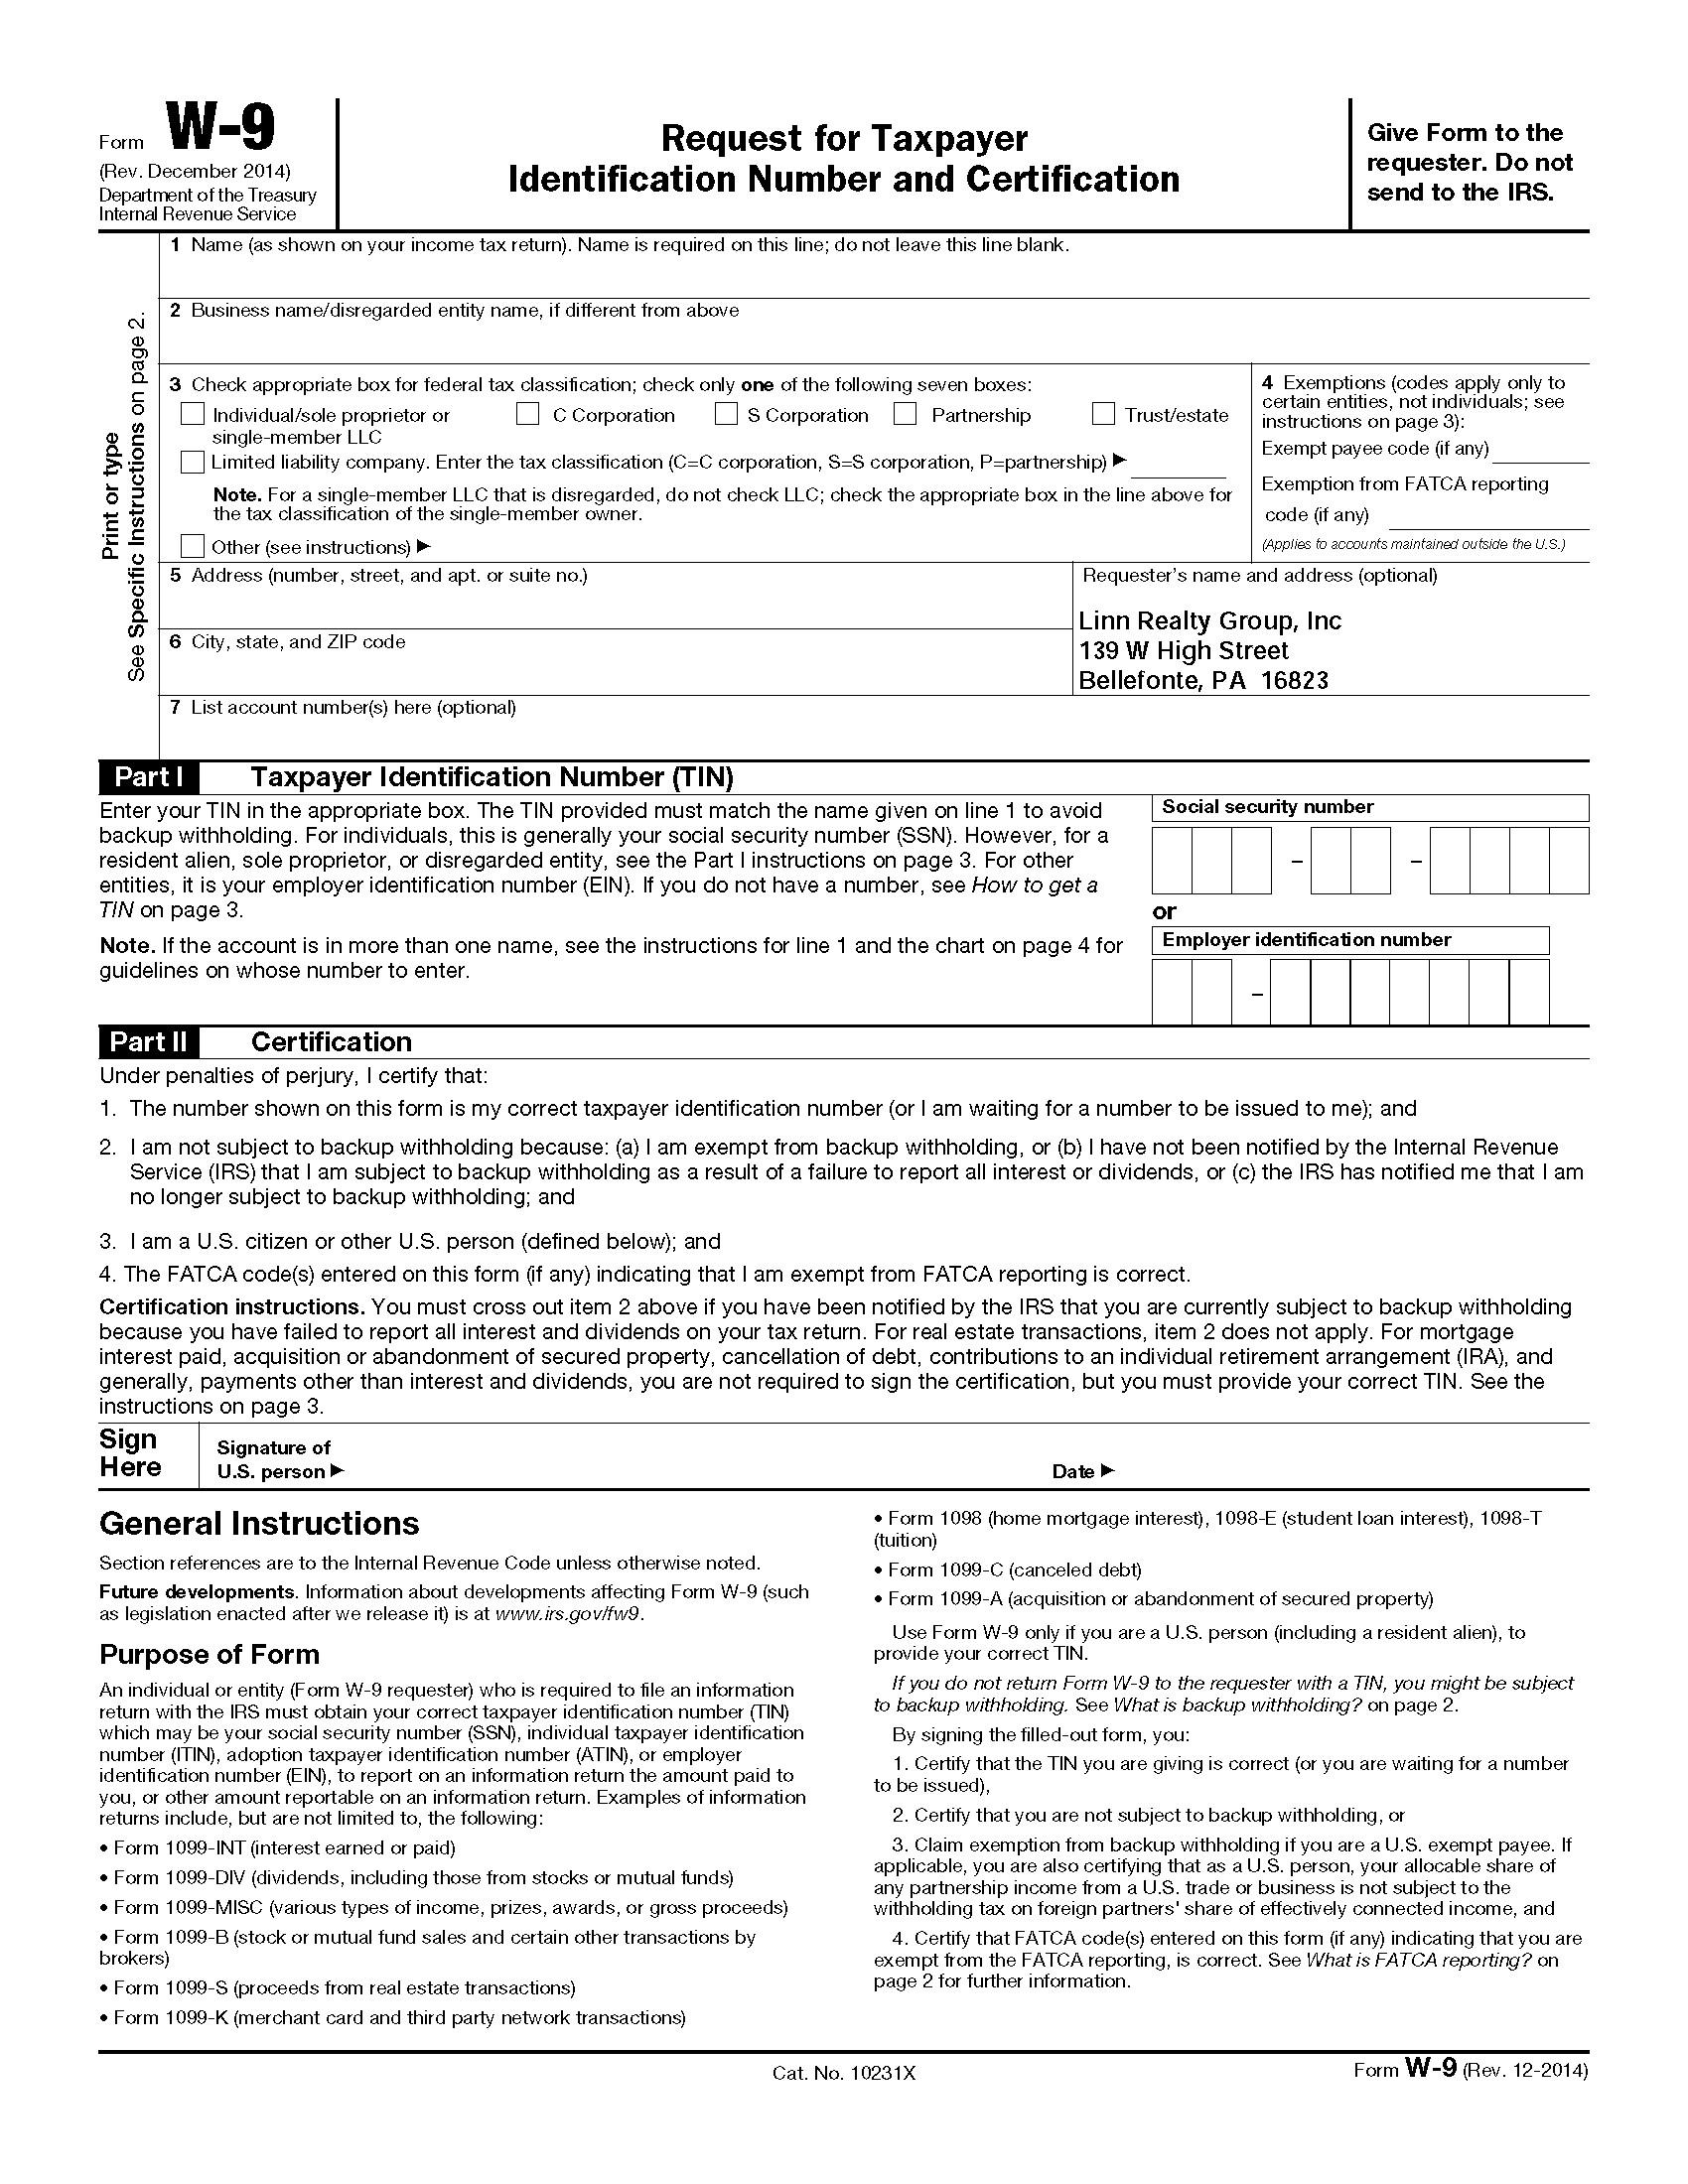 Blank 2019 W 9 Form Printable | Calendar Template Printable-Print Irs W-9 Blank Form 2020